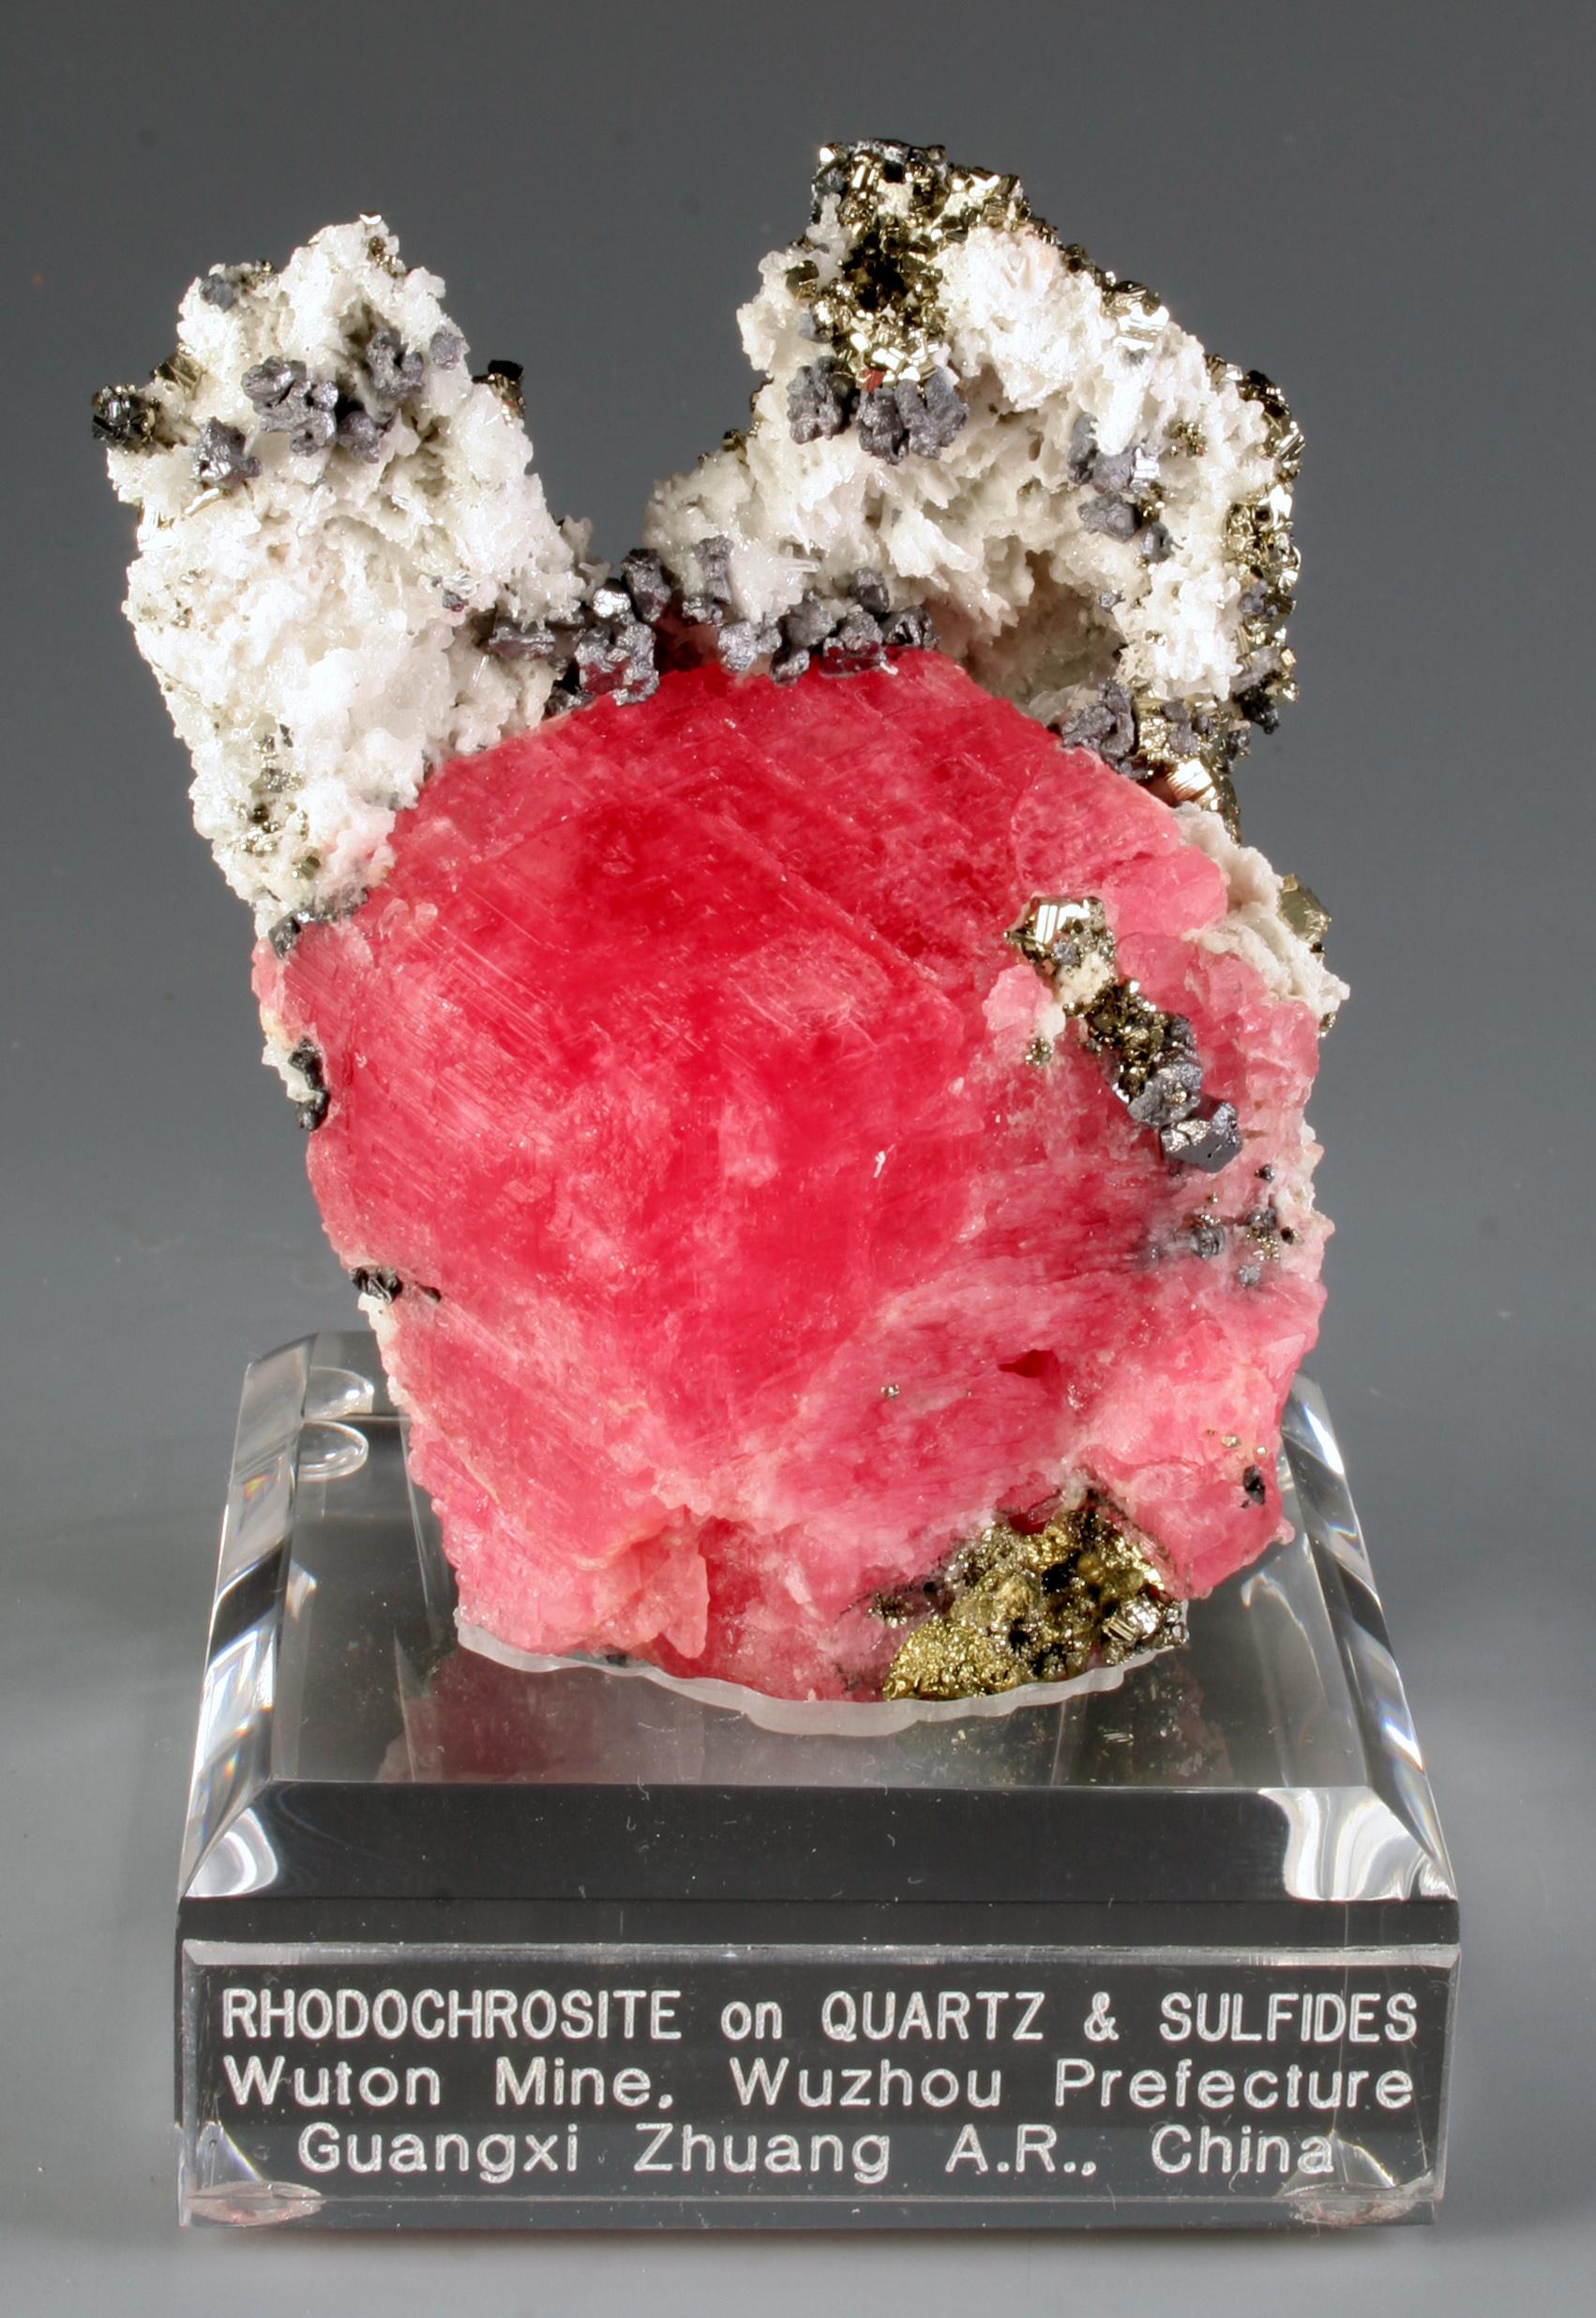 Rhodochrosite and Pyrite